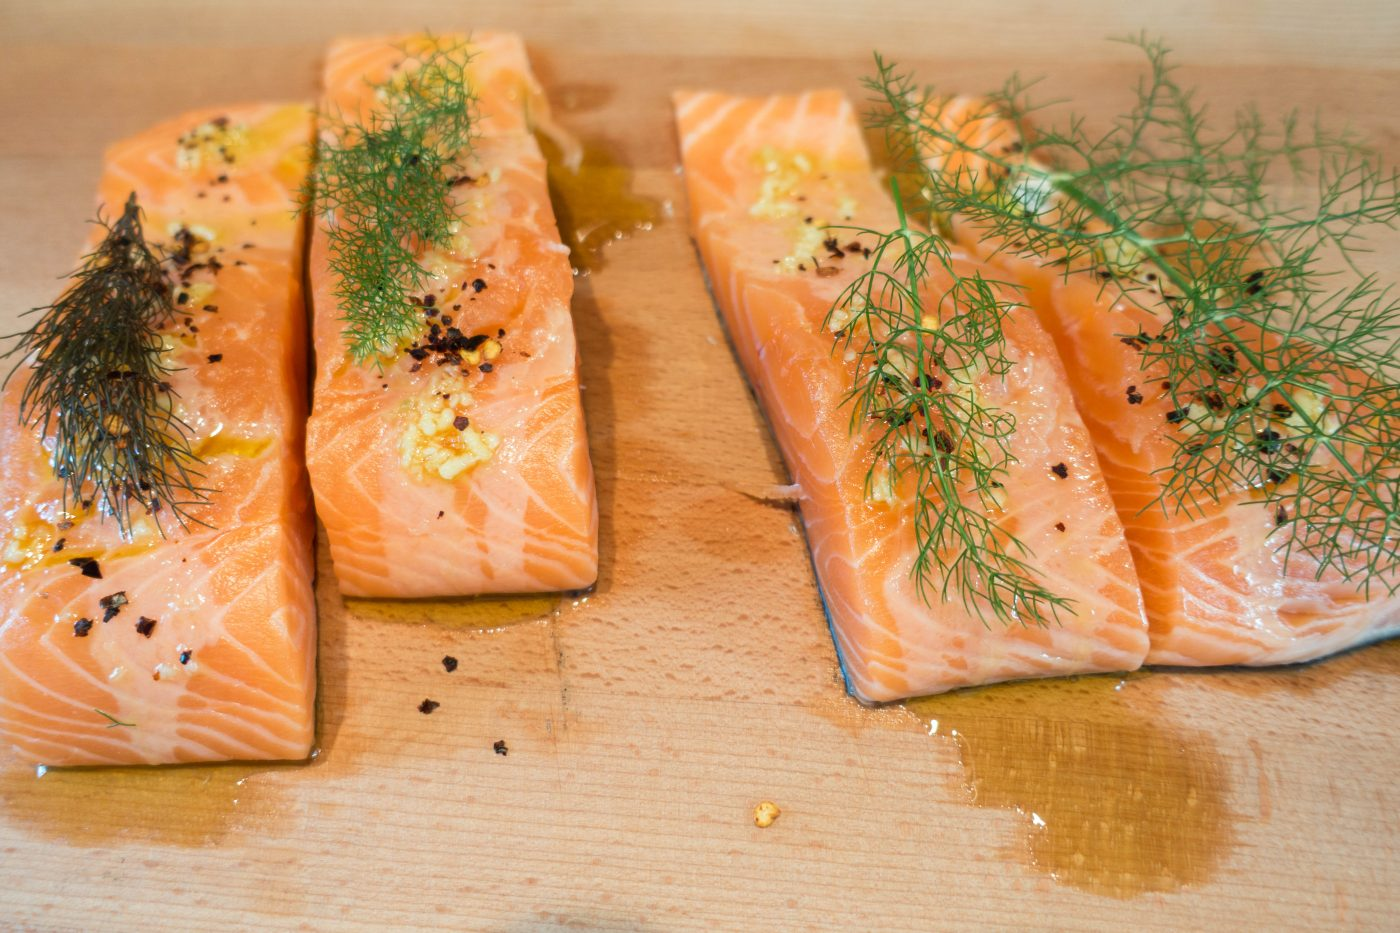 BBQ mal anders: Heiss geräucherter Lachs